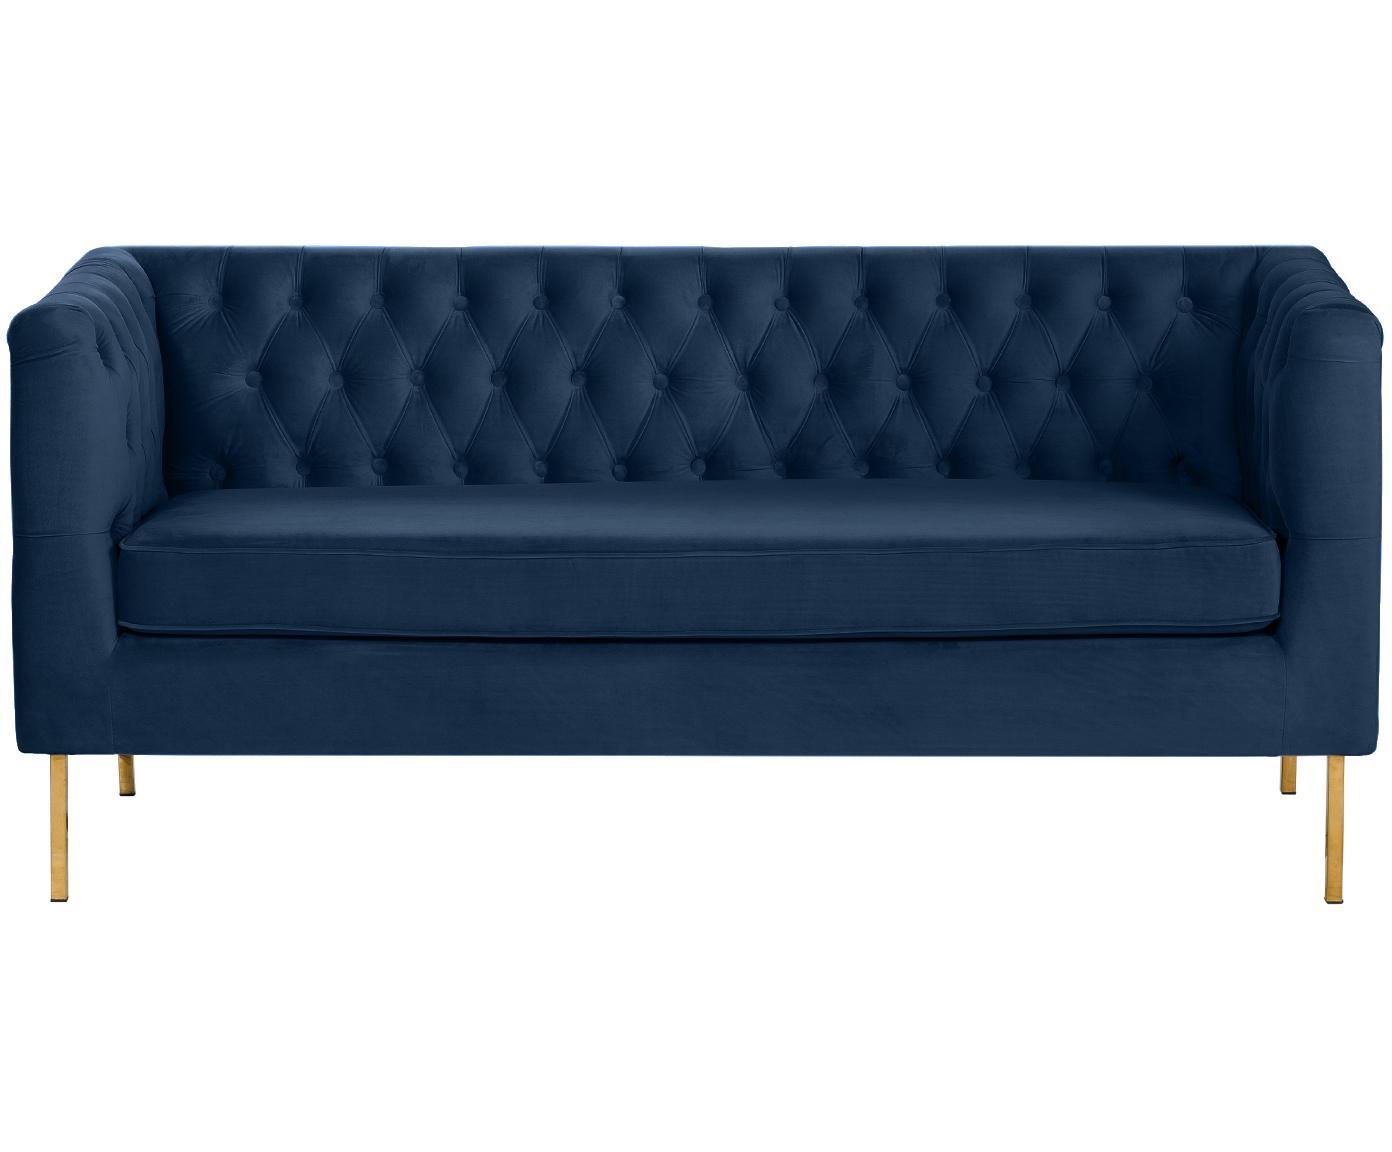 Chesterfield-Samt-Sofa Chiara (2-Sitzer), Bezug: Samt (Polyester) 20.000 S, Gestell: Massives Birkenholz, Füße: Metall, galvanisiert, Samt Blau, B 170 x T 72 cm